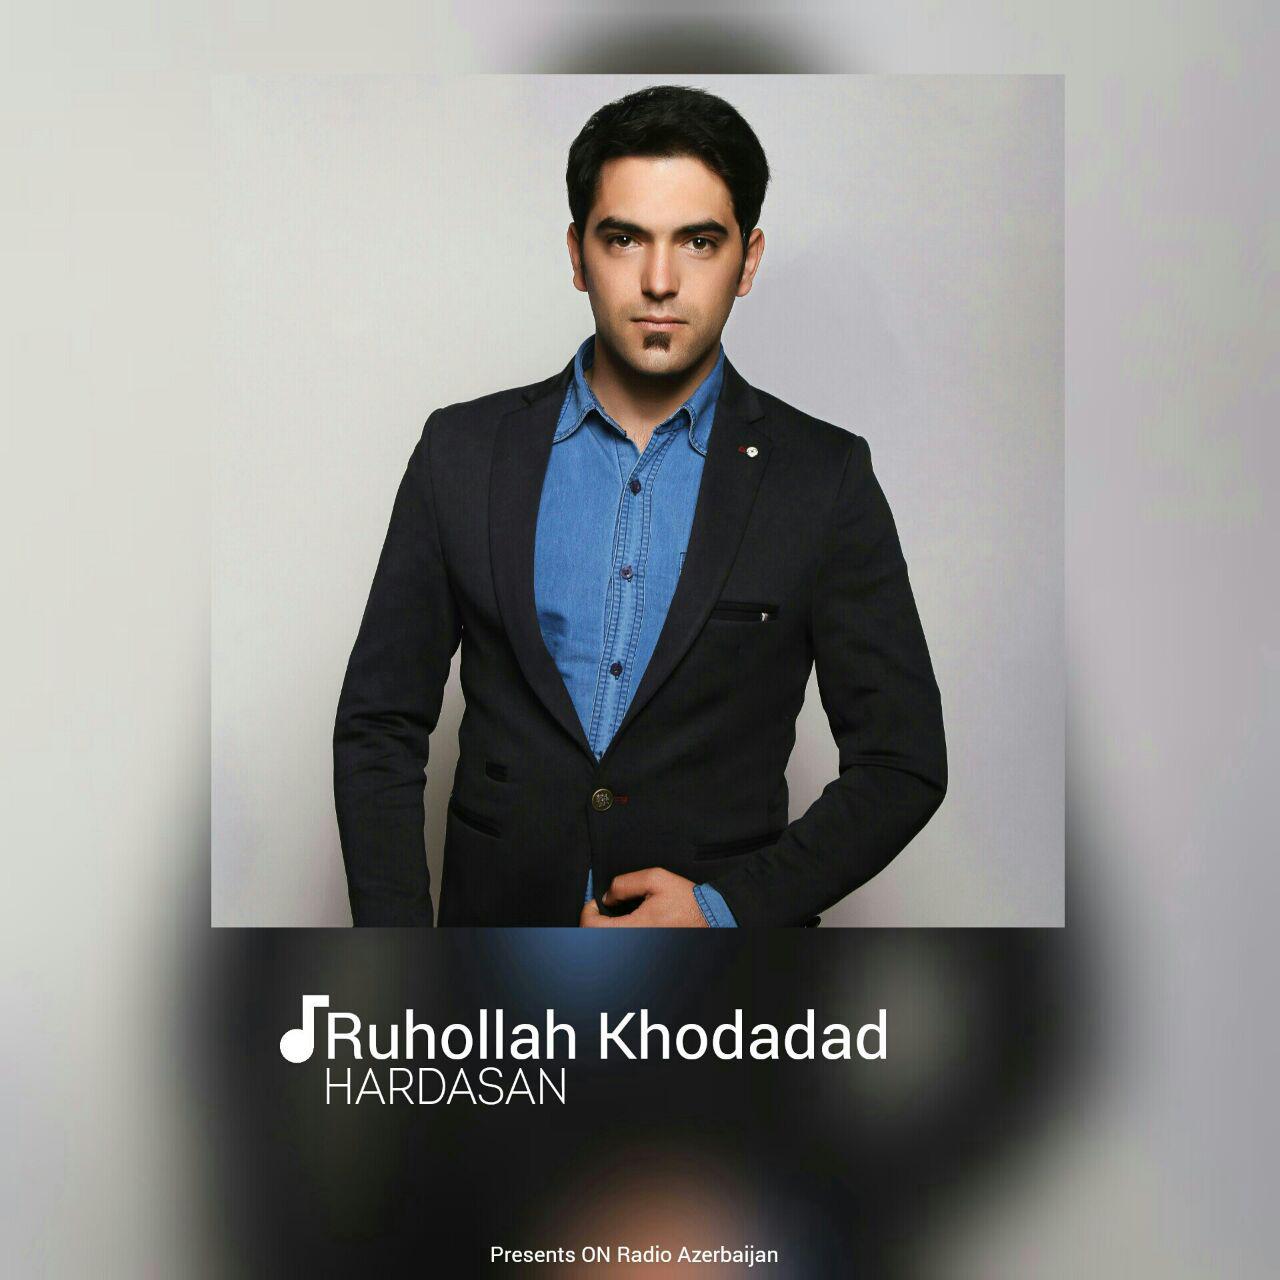 http://s8.picofile.com/file/8300698134/104Ruhollah_Khodadad_Hardasan.jpg